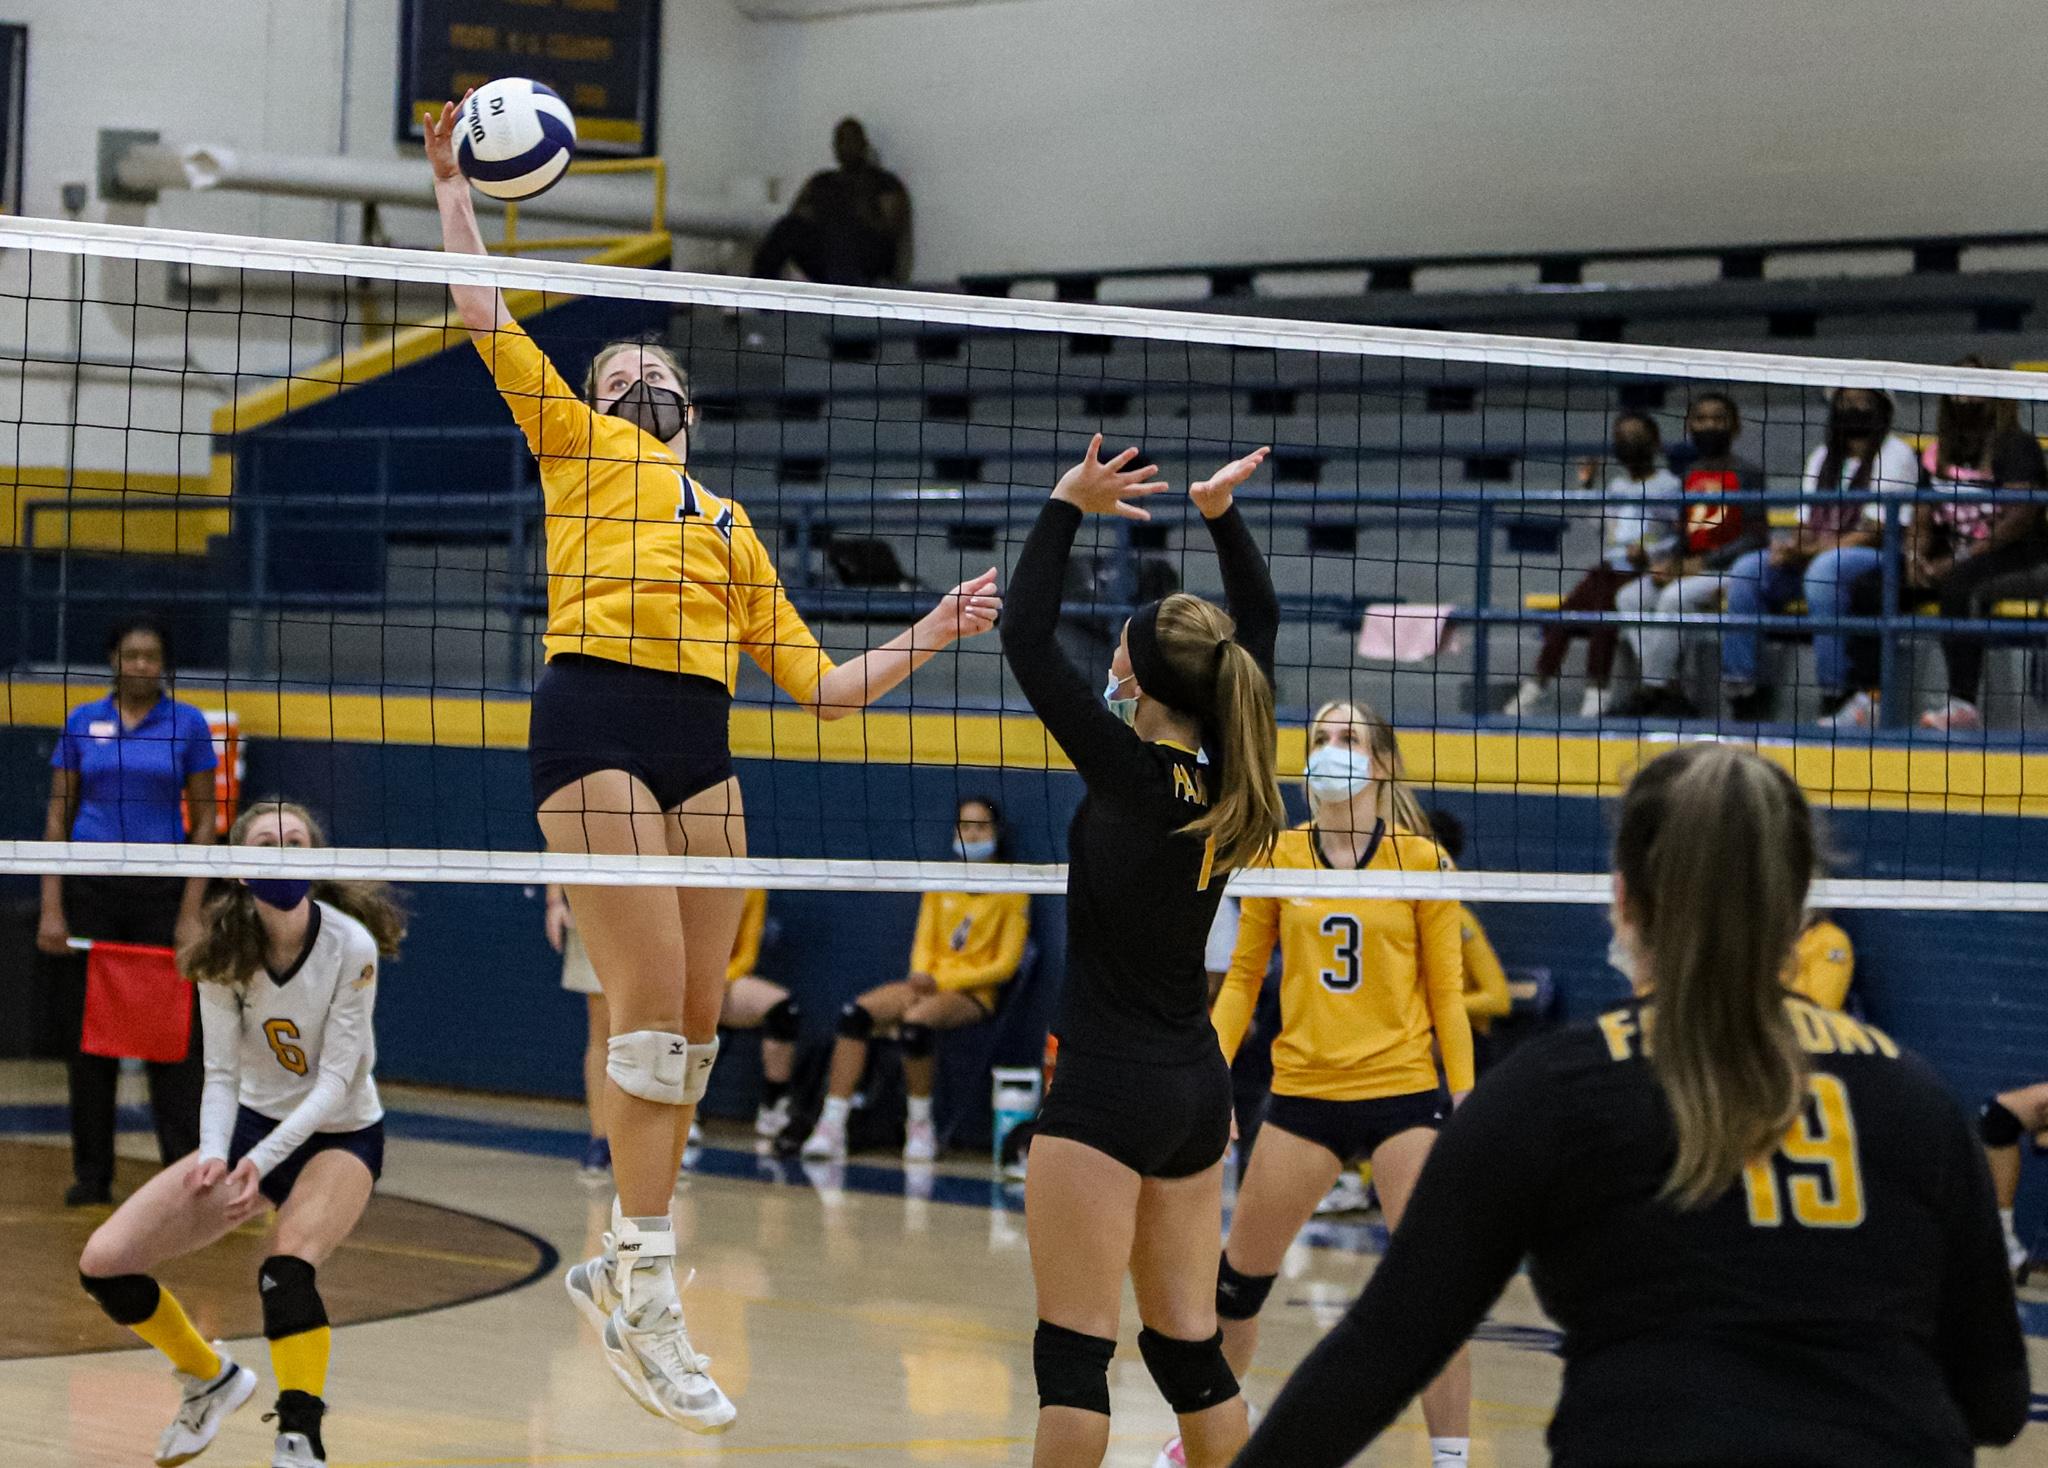 Goldsboro vs. Fairmont Volleyball 10/23/21